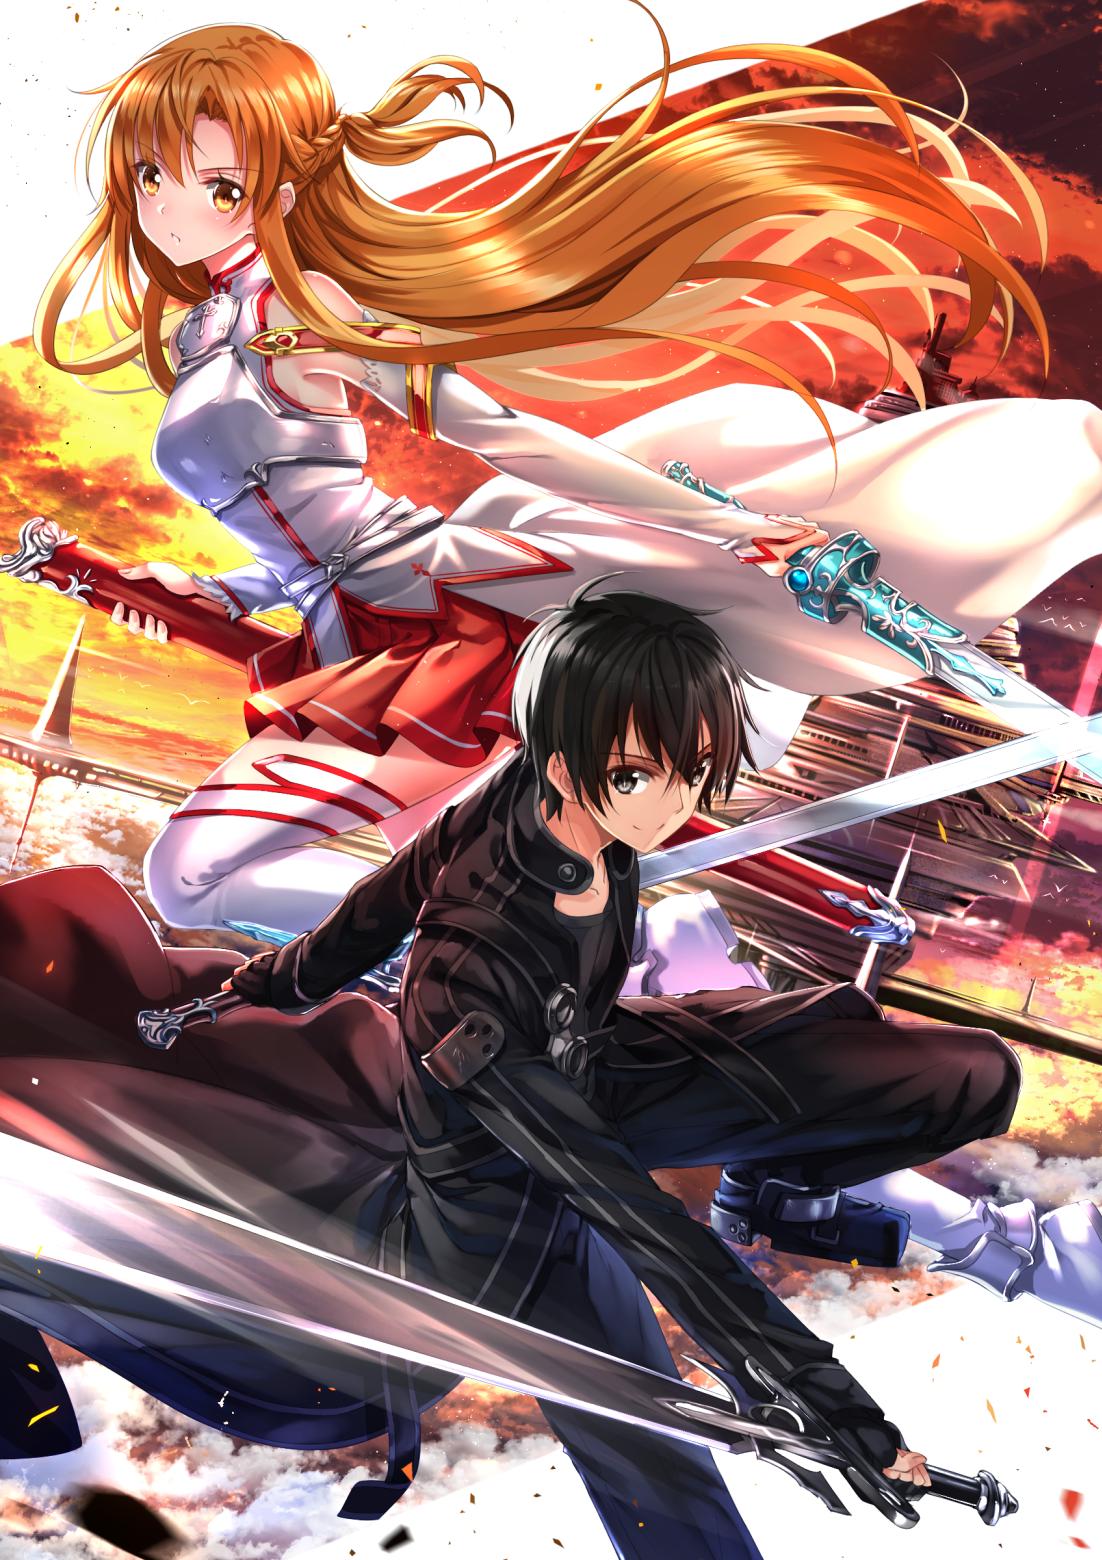 Yuuki Asuna And Kirigaya Kazuto Kirito Sword Art Online Anime Fanart By Swordsouls Sword Art Online Wallpaper Sword Art Sword Art Online Asuna